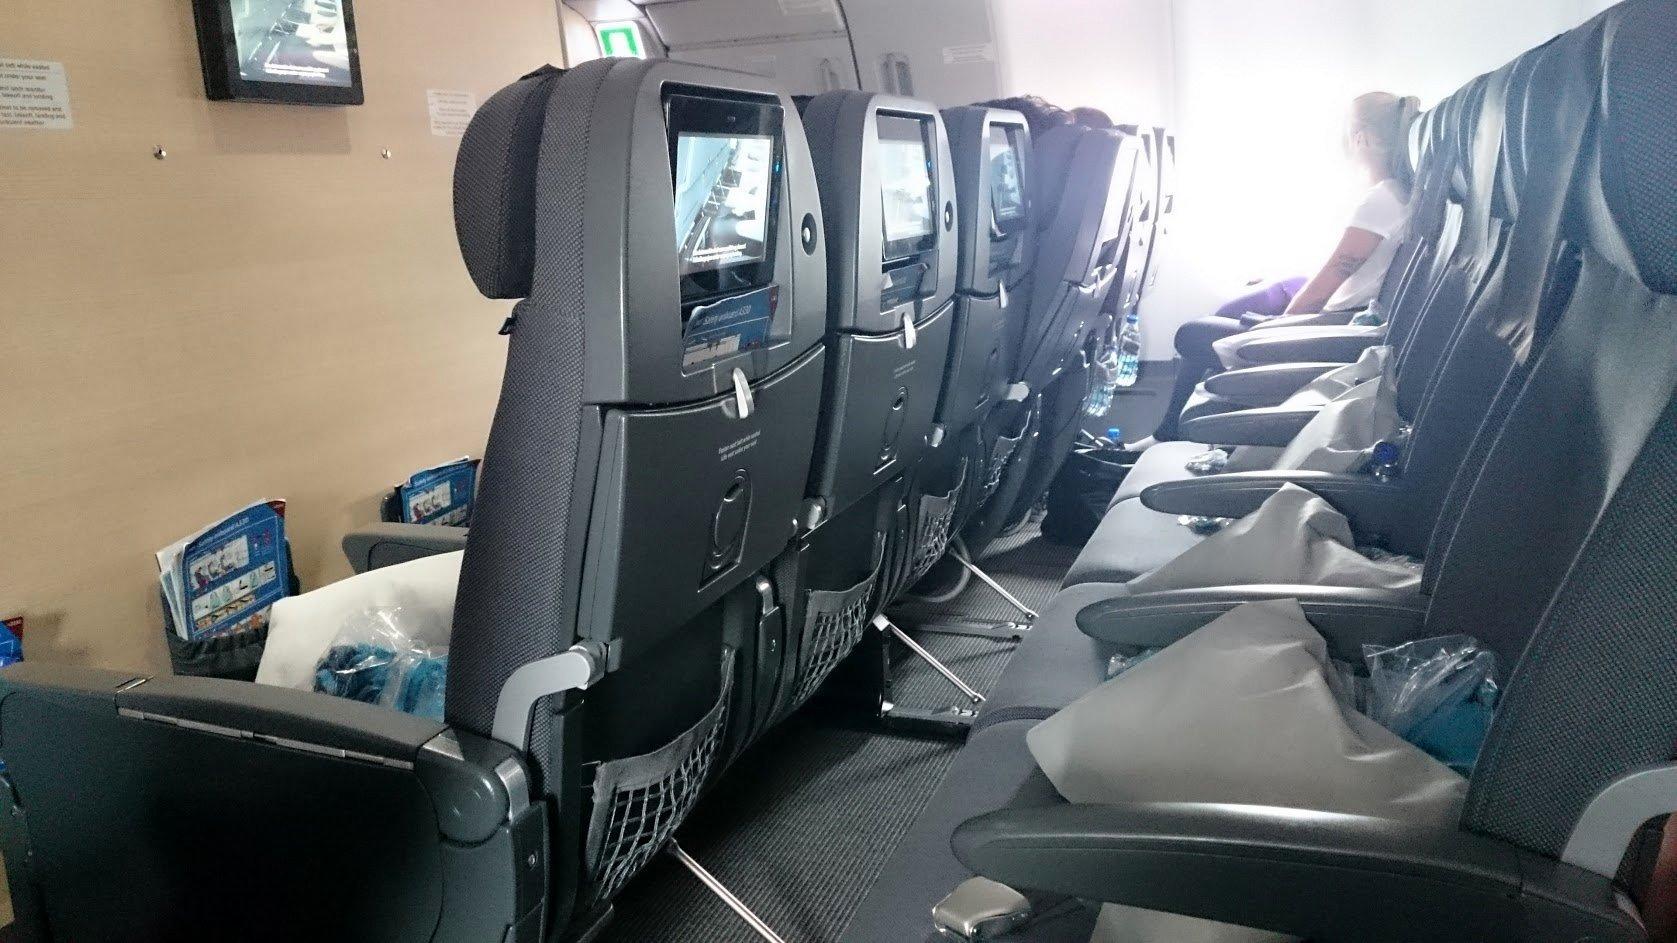 SAS Plus matkustusluokka korotus kokemuksia